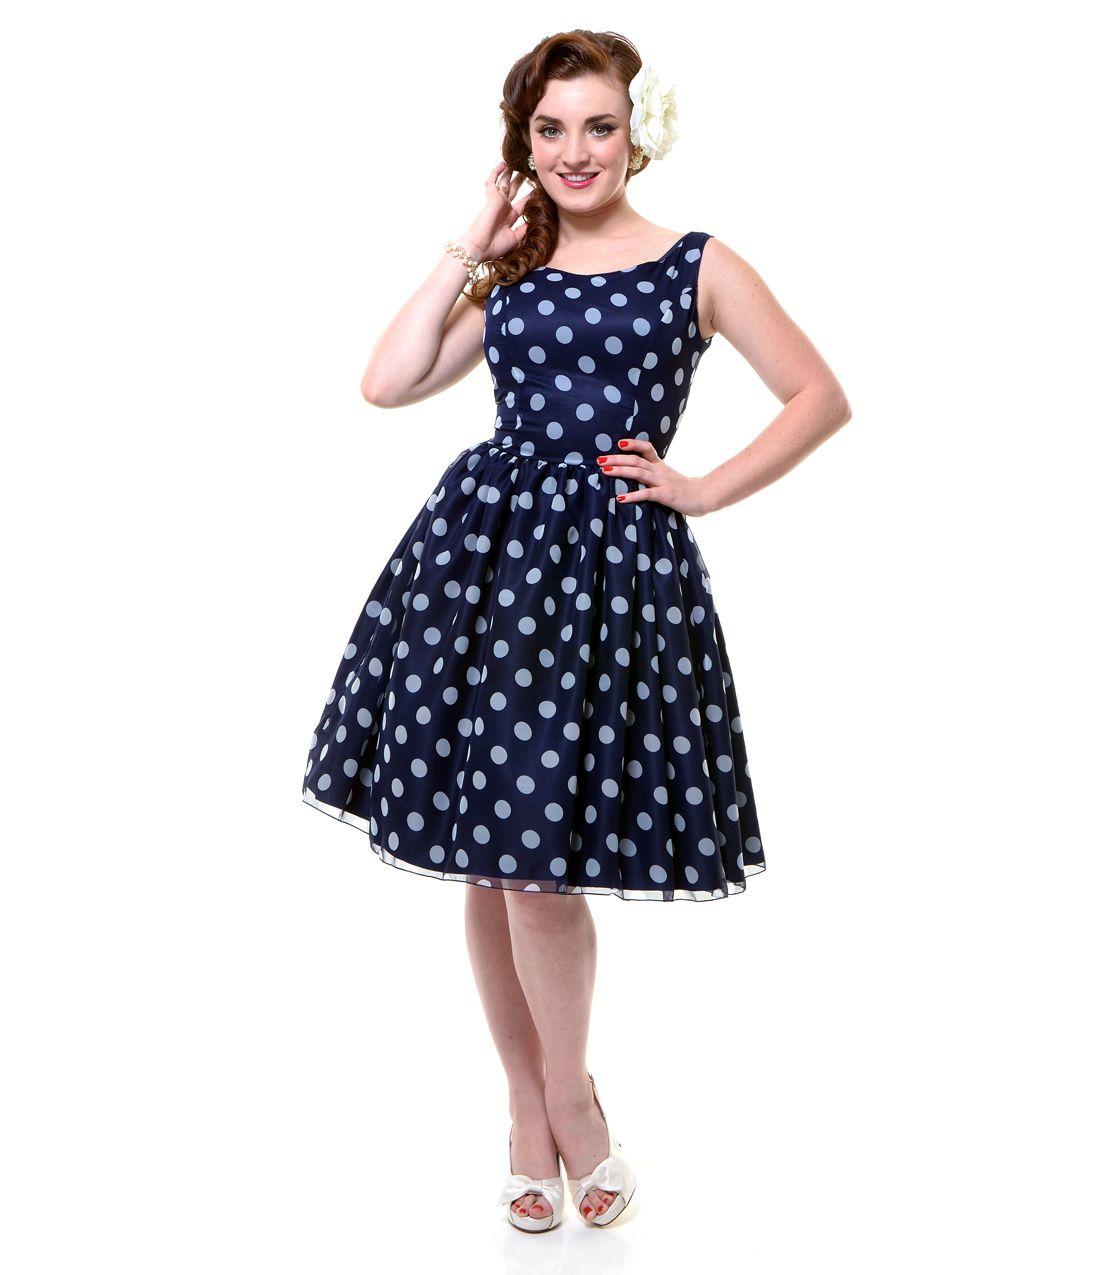 Retro style navy blue dress